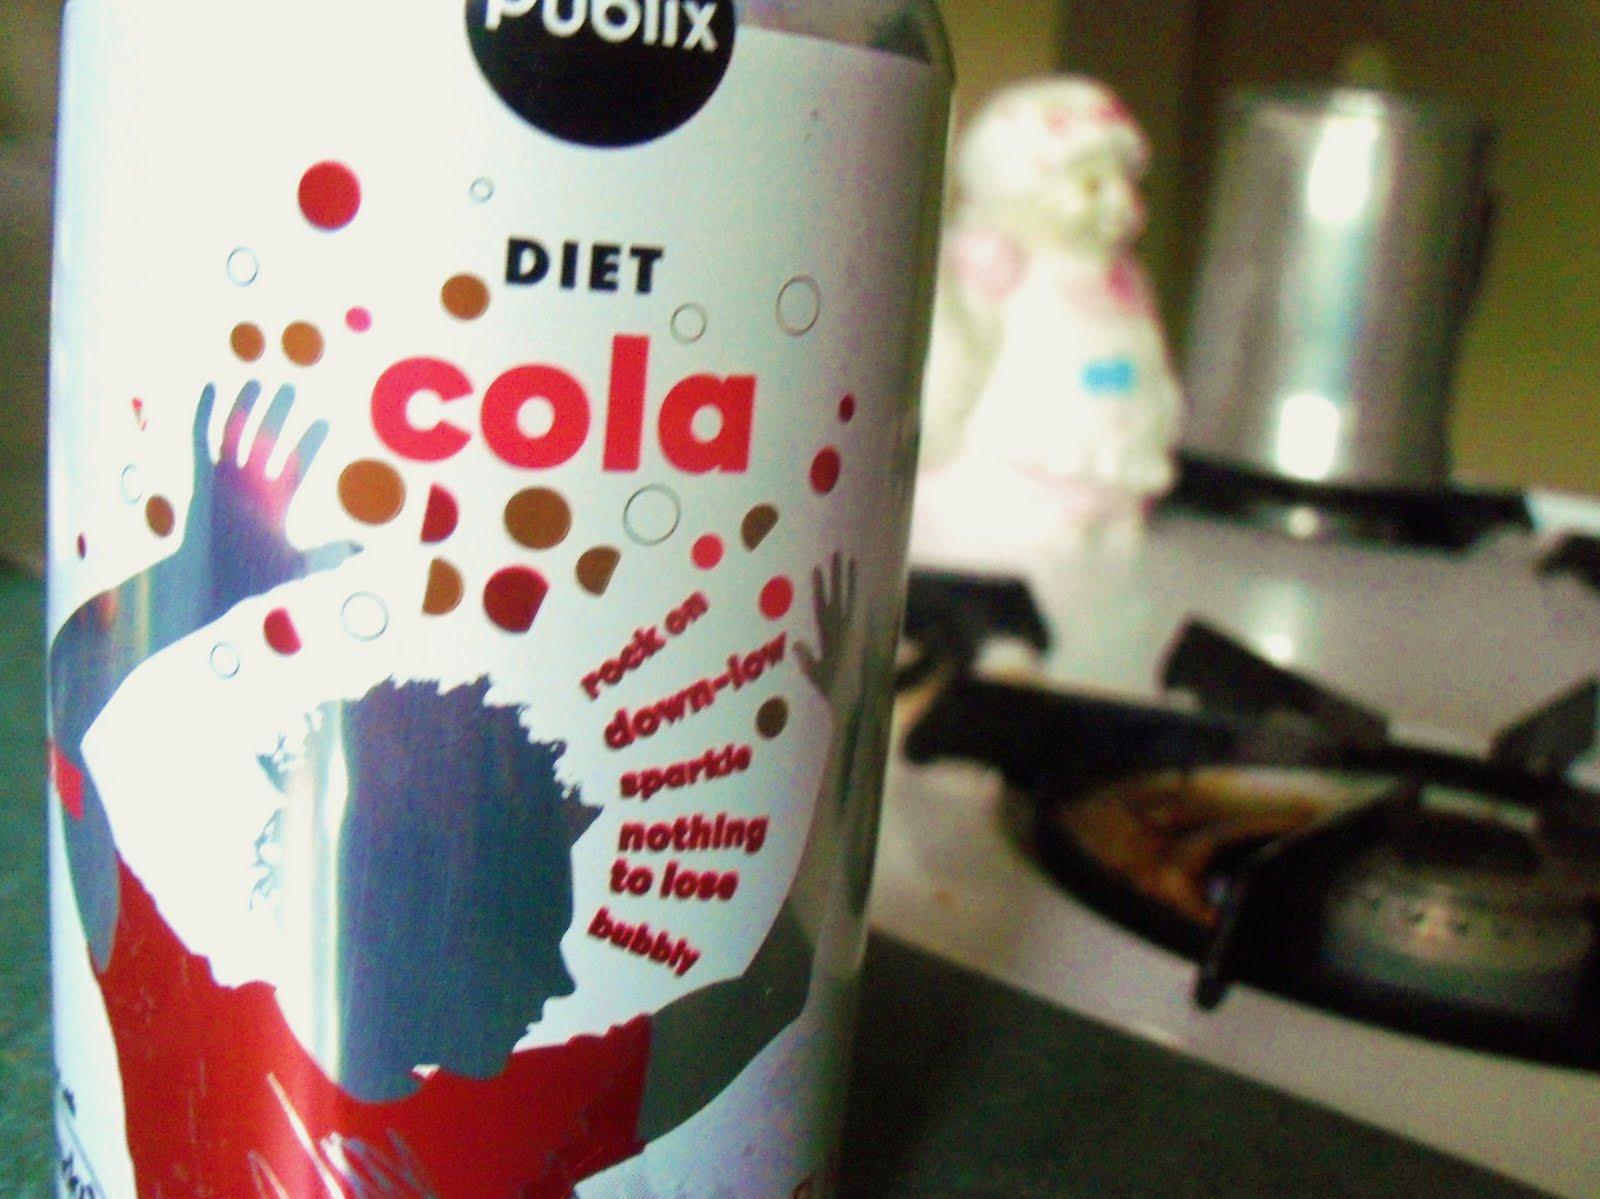 The Absurdity of Publix Diet Cola